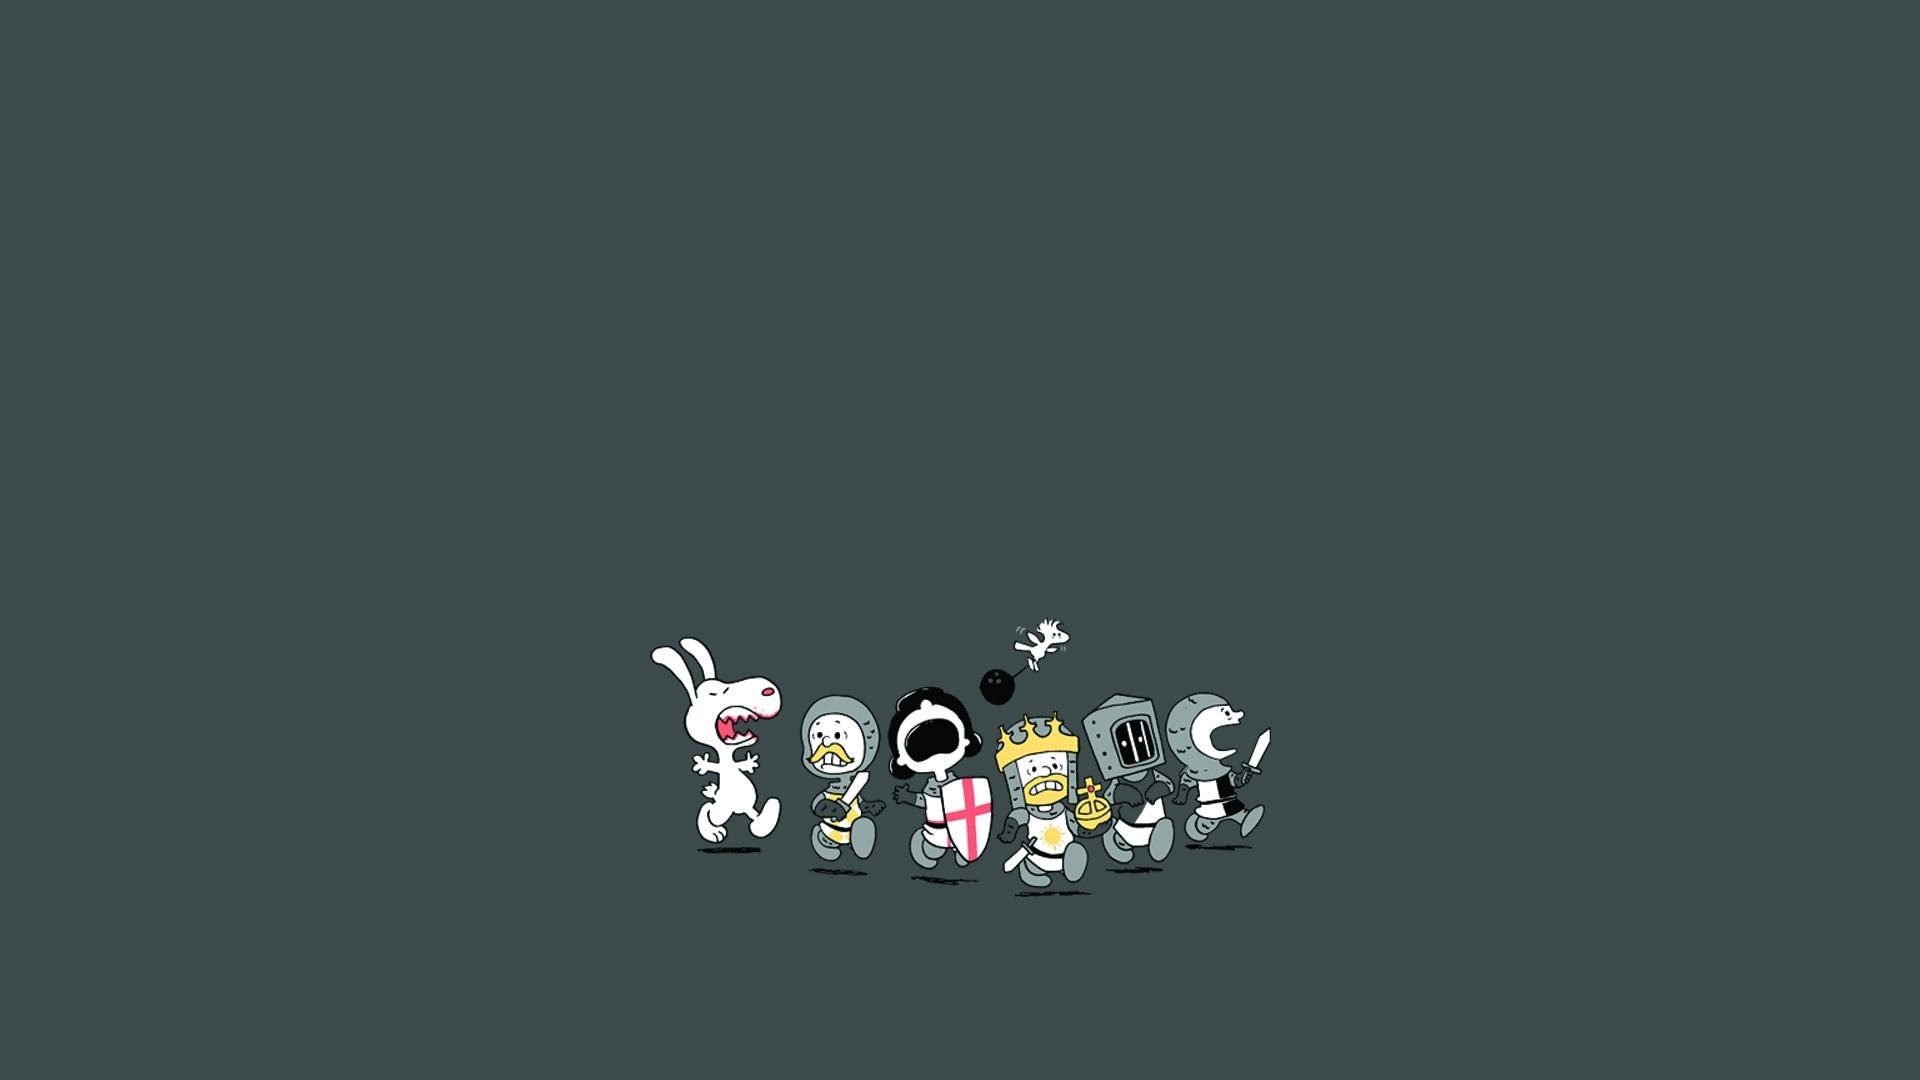 Snoopy Wallpaper Desktop Background 56 Images